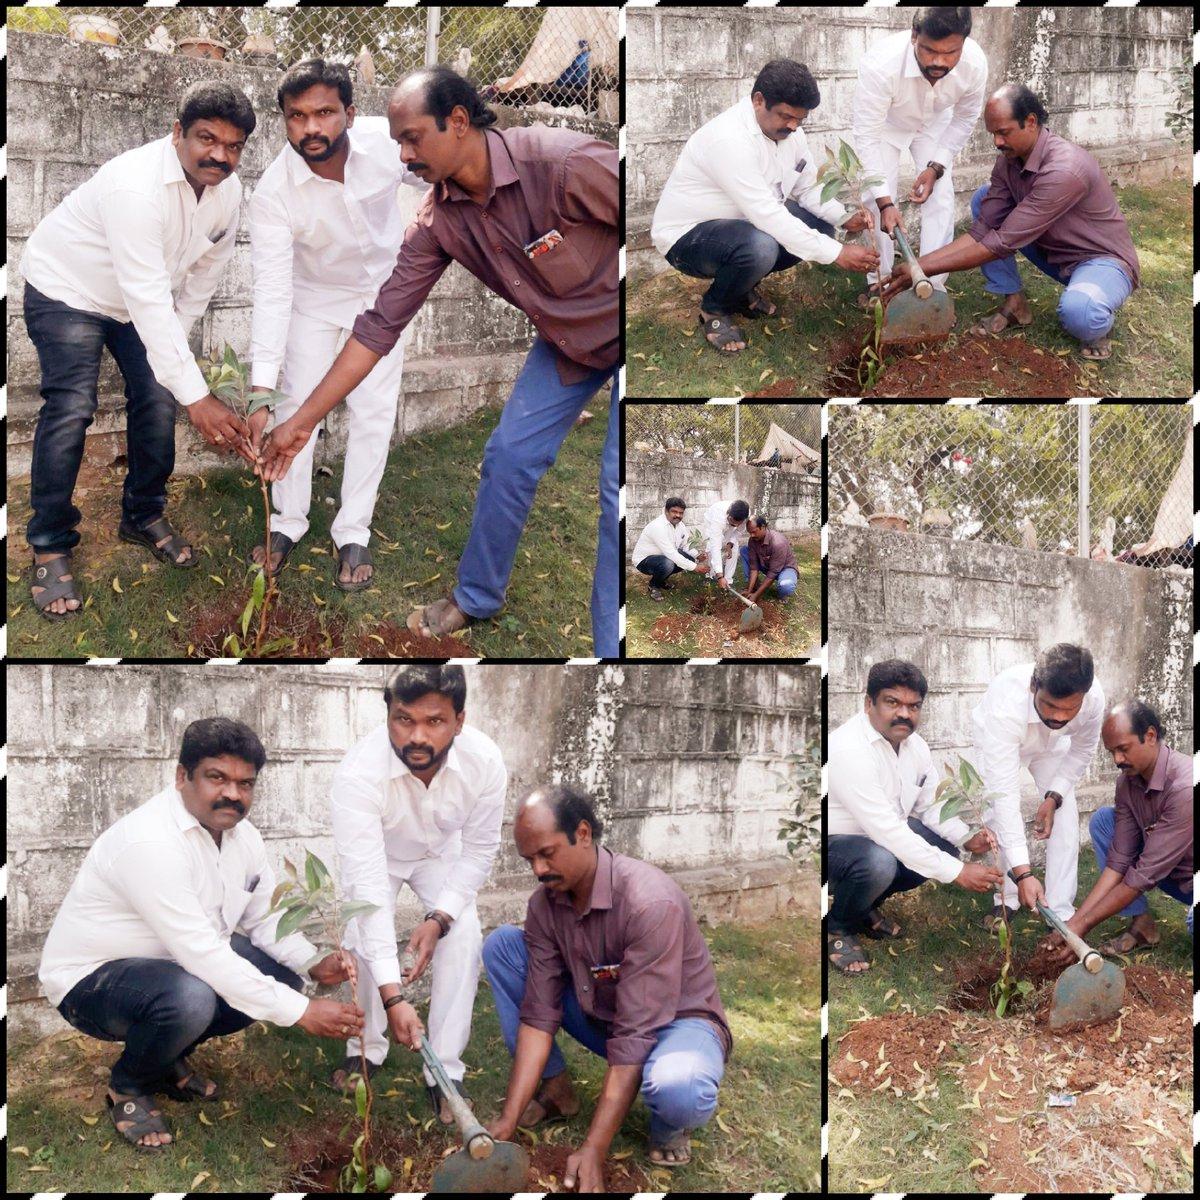 Happy Birthday to Visionary Leader, Bhageeratha Saradhi, Telangana YudhamaNetha KCR garu🎂🎉💐💪🙏  Many more Happy Returns of the day LongLive KCR Sir🙏🙏 @TelanganaCMO @KTRTRS @RaoKavitha @MPsantoshtrs  @trspartyonline @Greenindiachal2 @DigitalMediaTS @TelanganaToday  Vaktha🌱